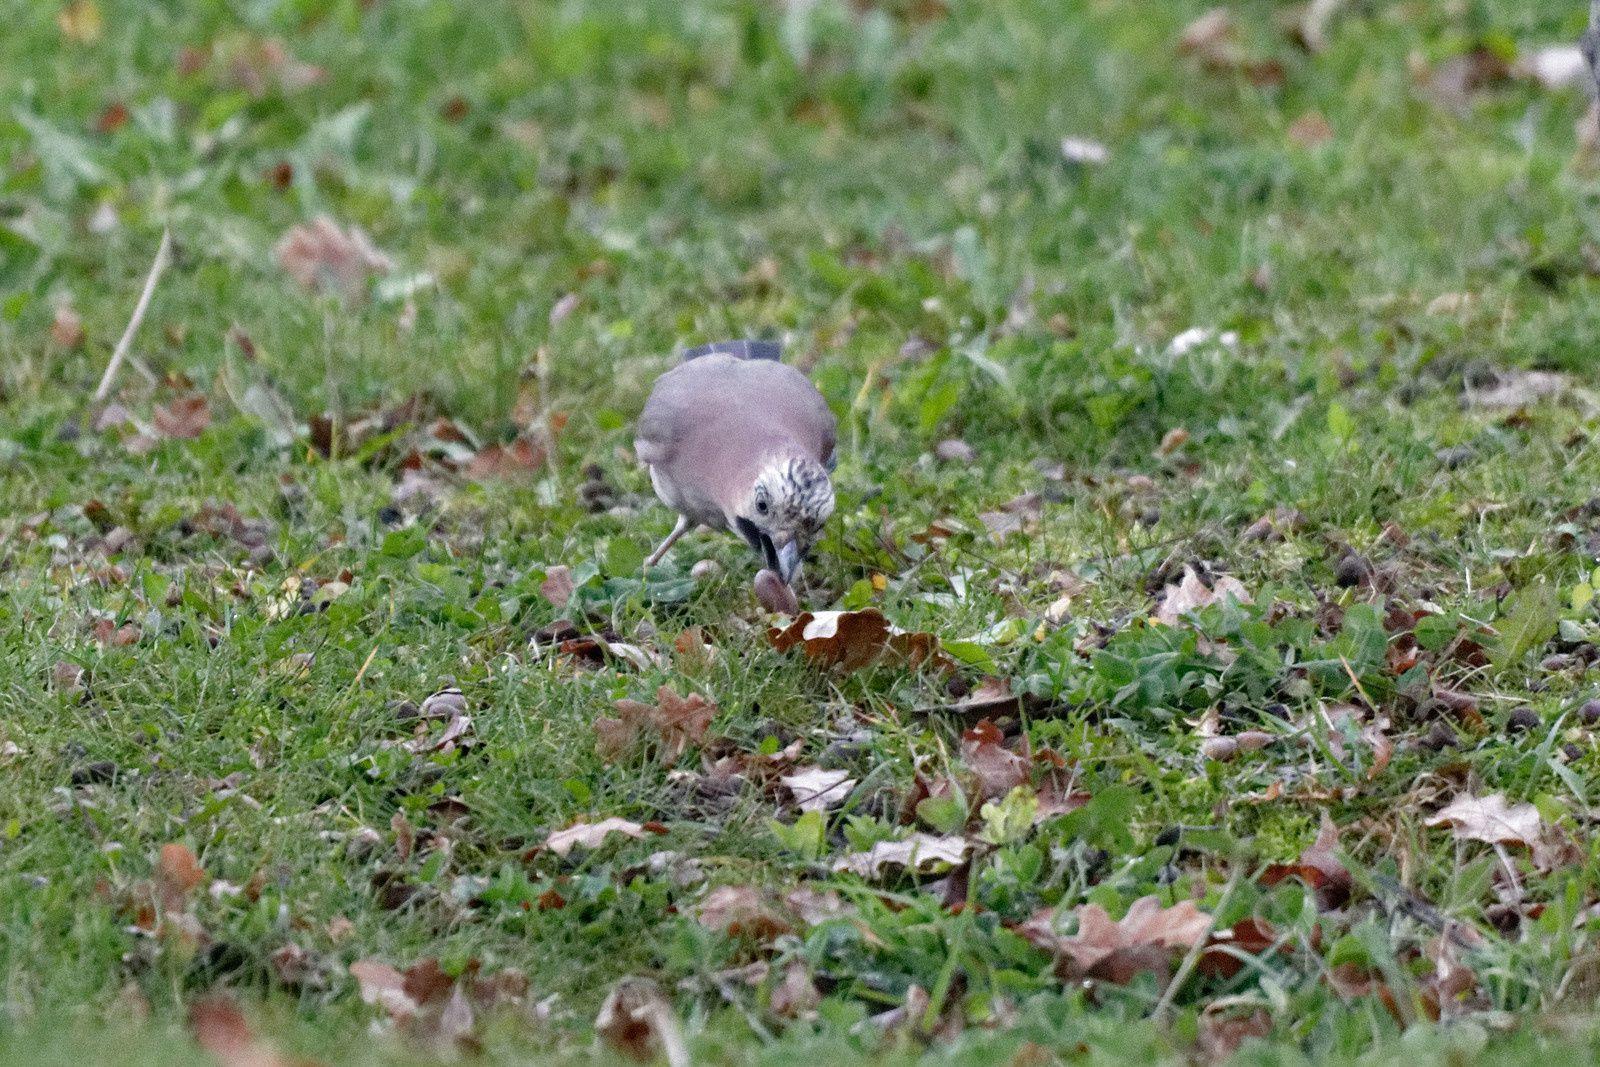 340 - Pic Epeiche, tu creuses ton nid pour cet hiver ? : 30/11/2017